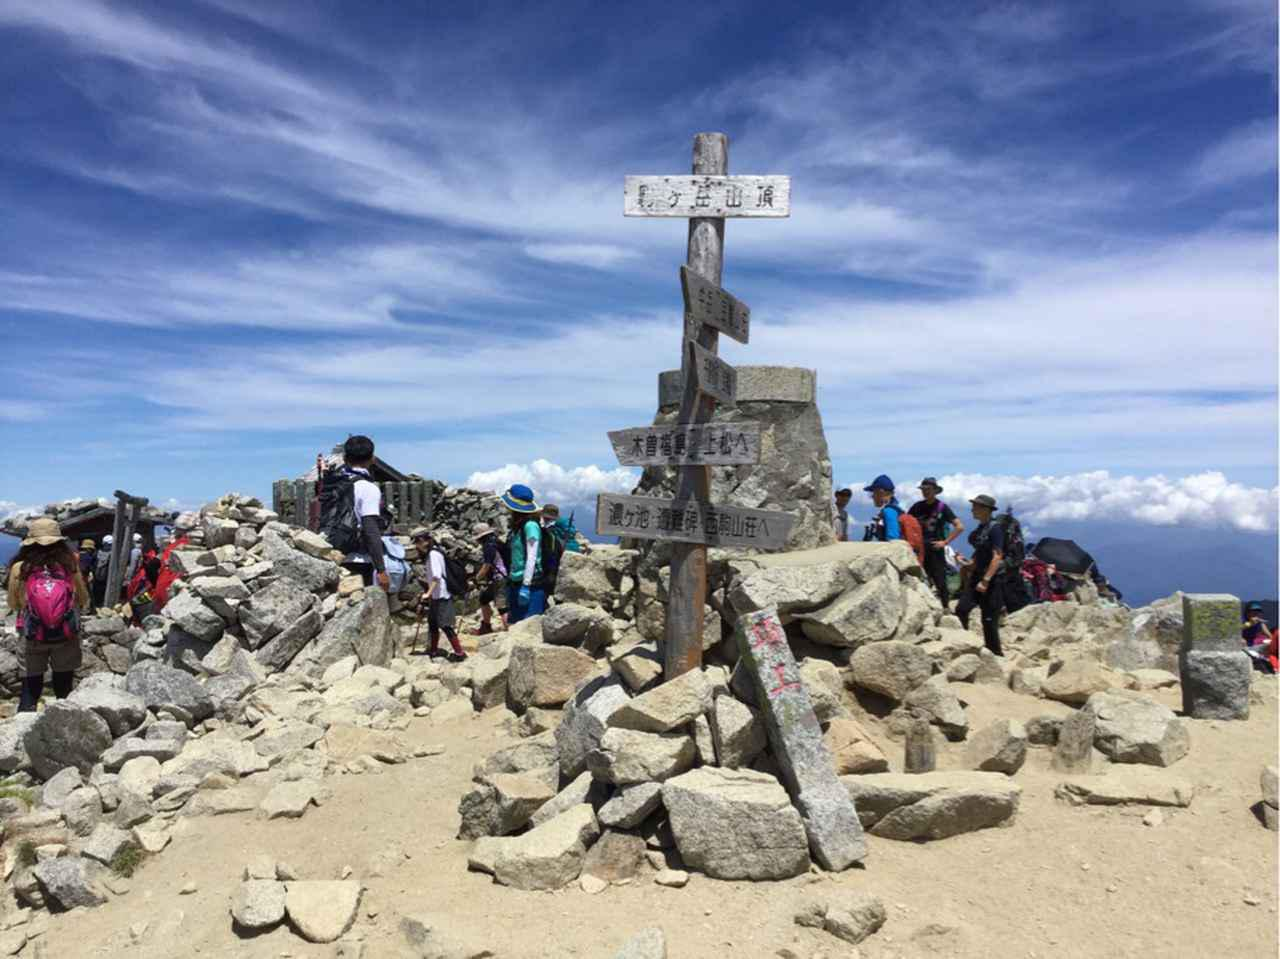 画像: 木曽駒ケ岳山頂の風景